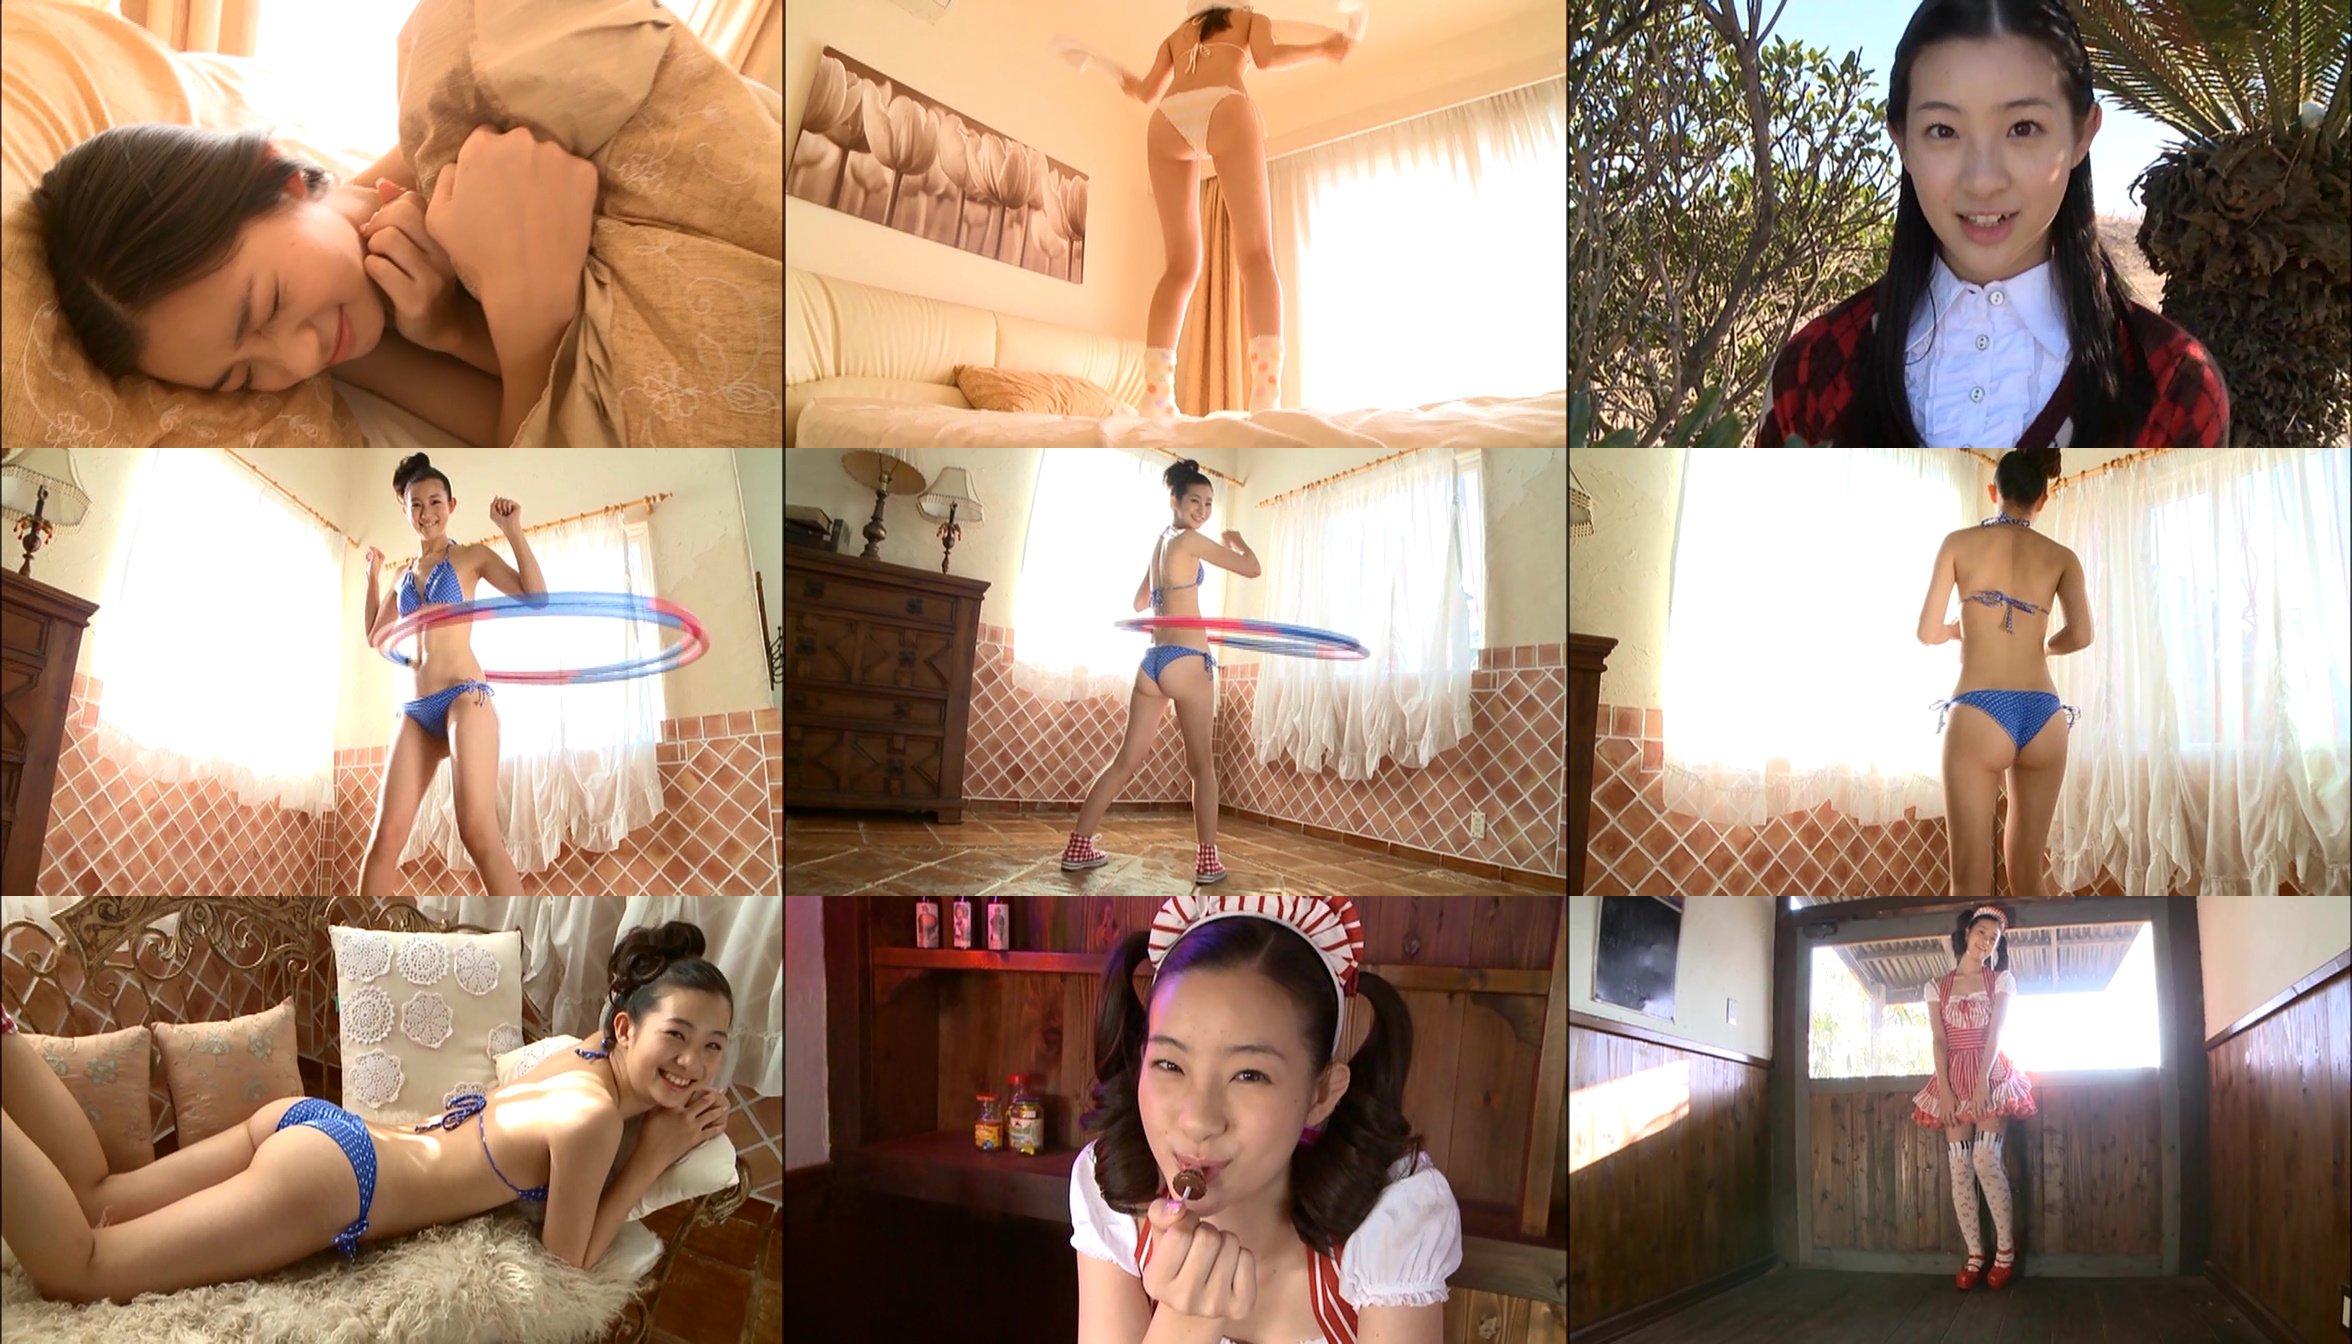 http://ec2.images-amazon.com/images/I/81WP1rTImnL.jpg